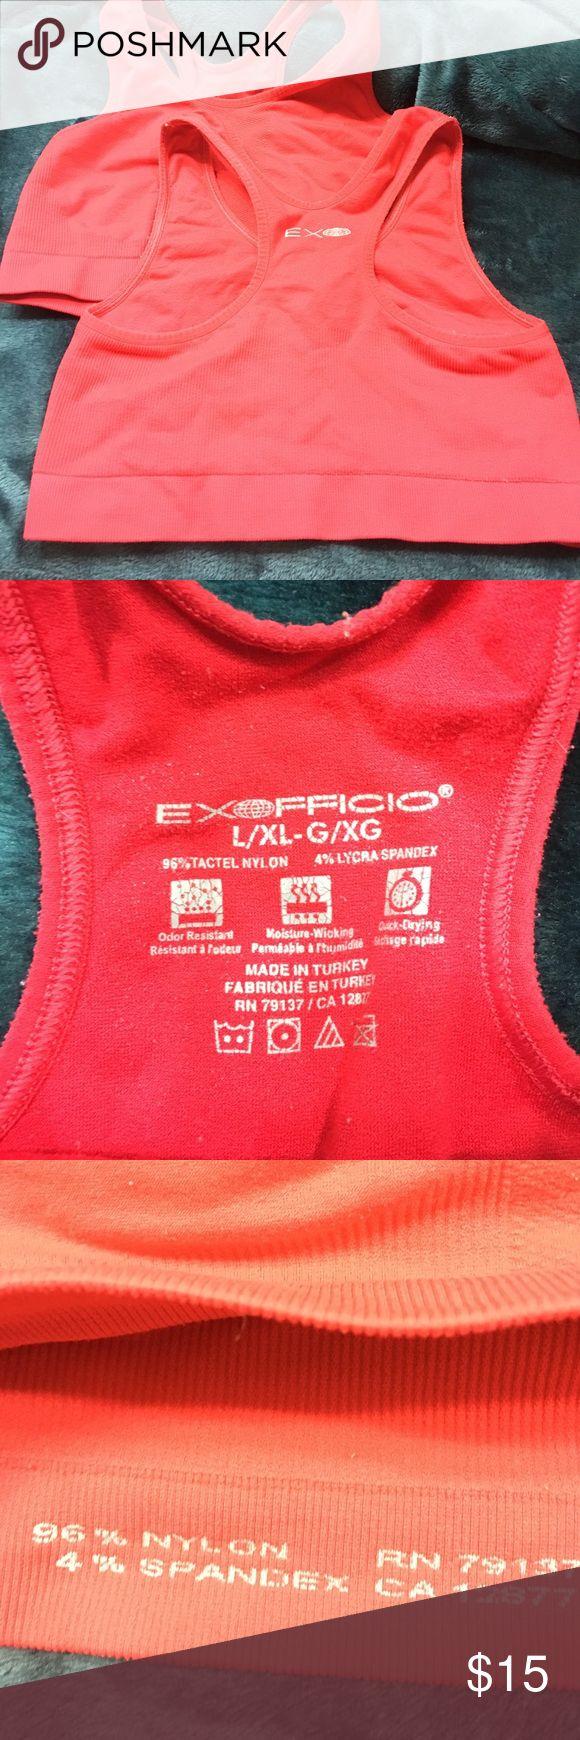 2 Stretchy Exfficio Sports Bras Stretchy Red Sports Bras you get 2. Size is L/XL Exfficio Tops